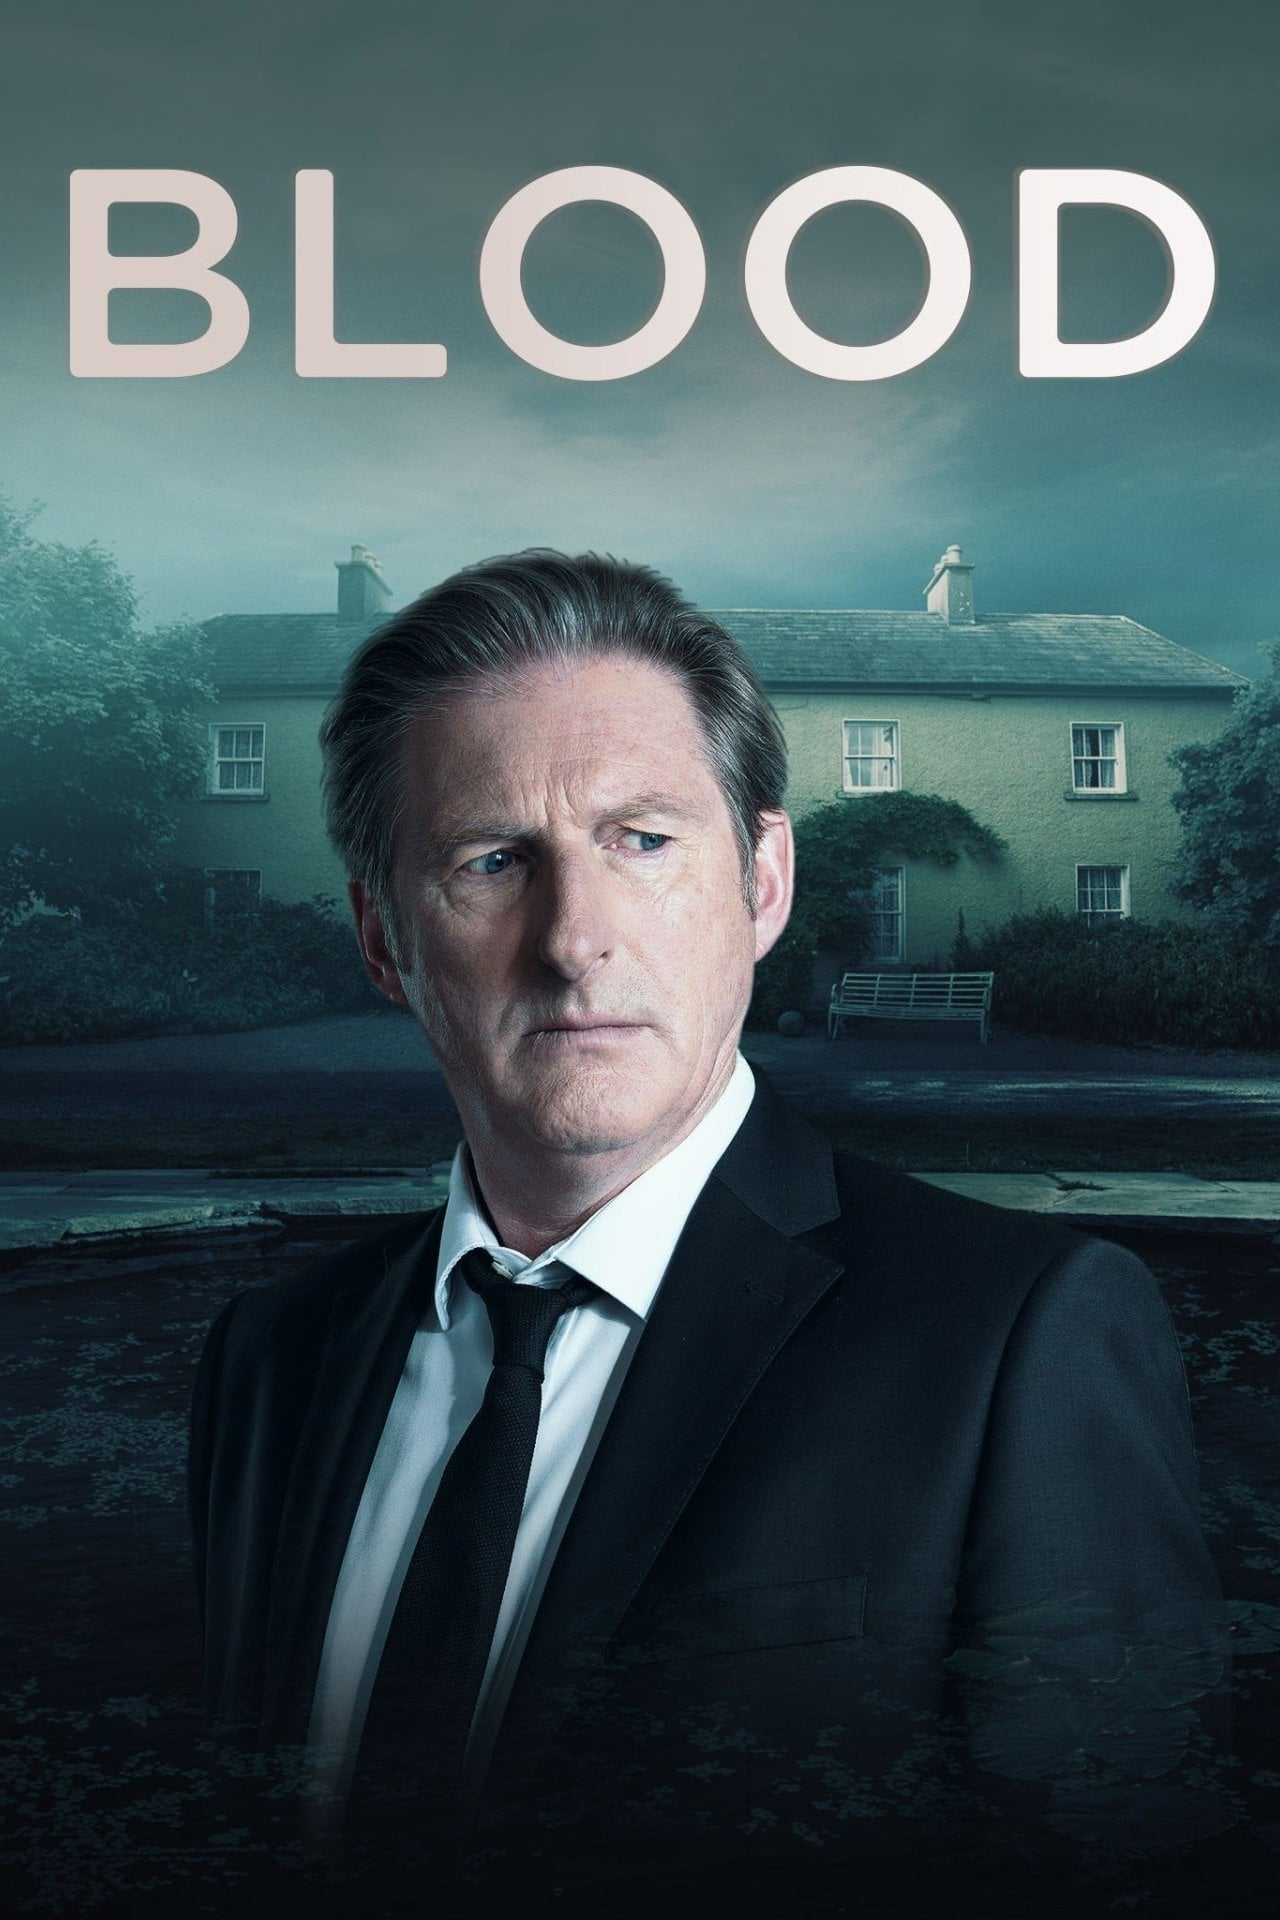 Blood (2018)